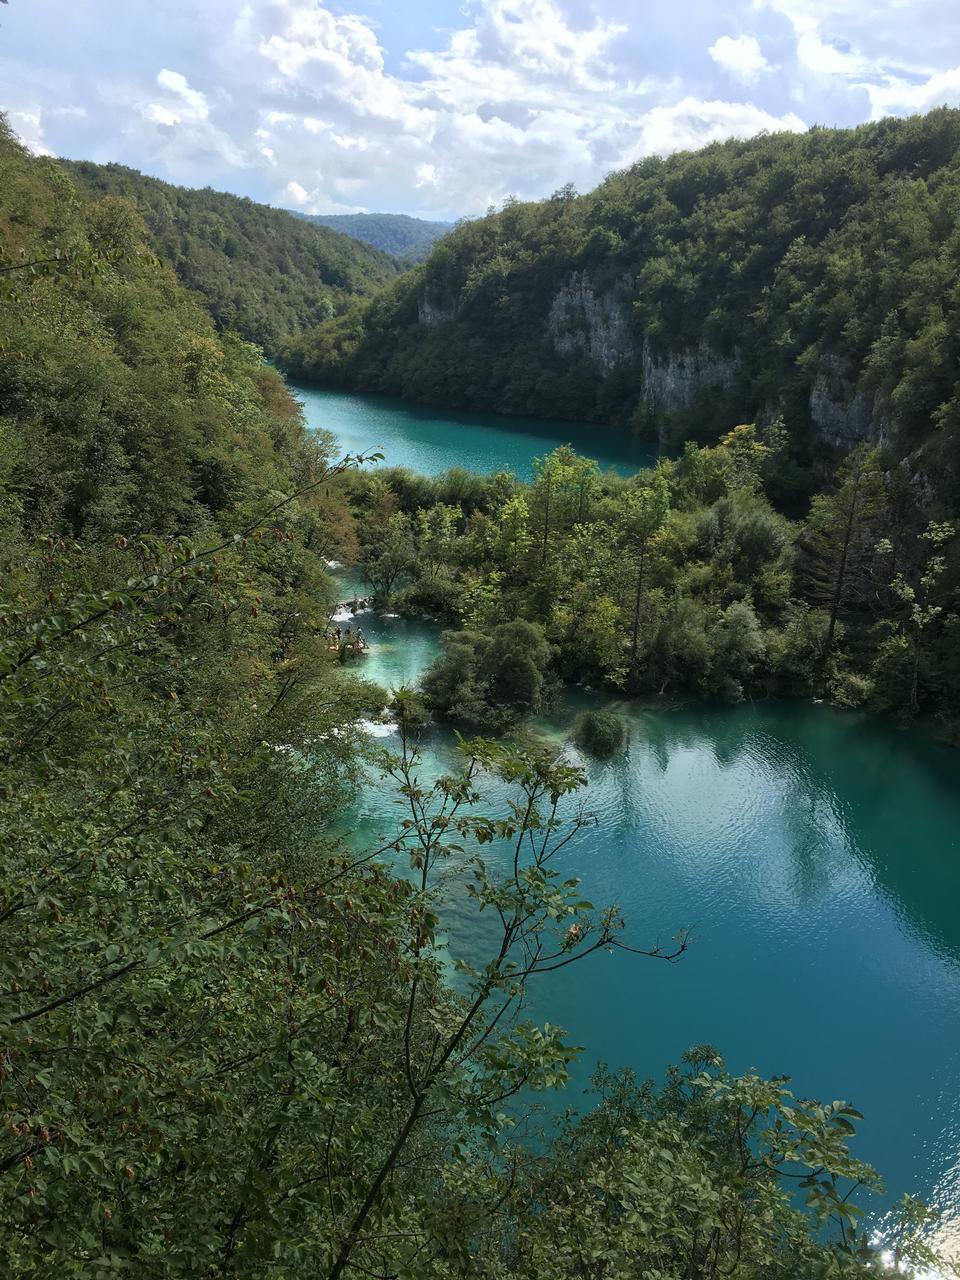 Plitvice lakes, national park Croatia, Europe